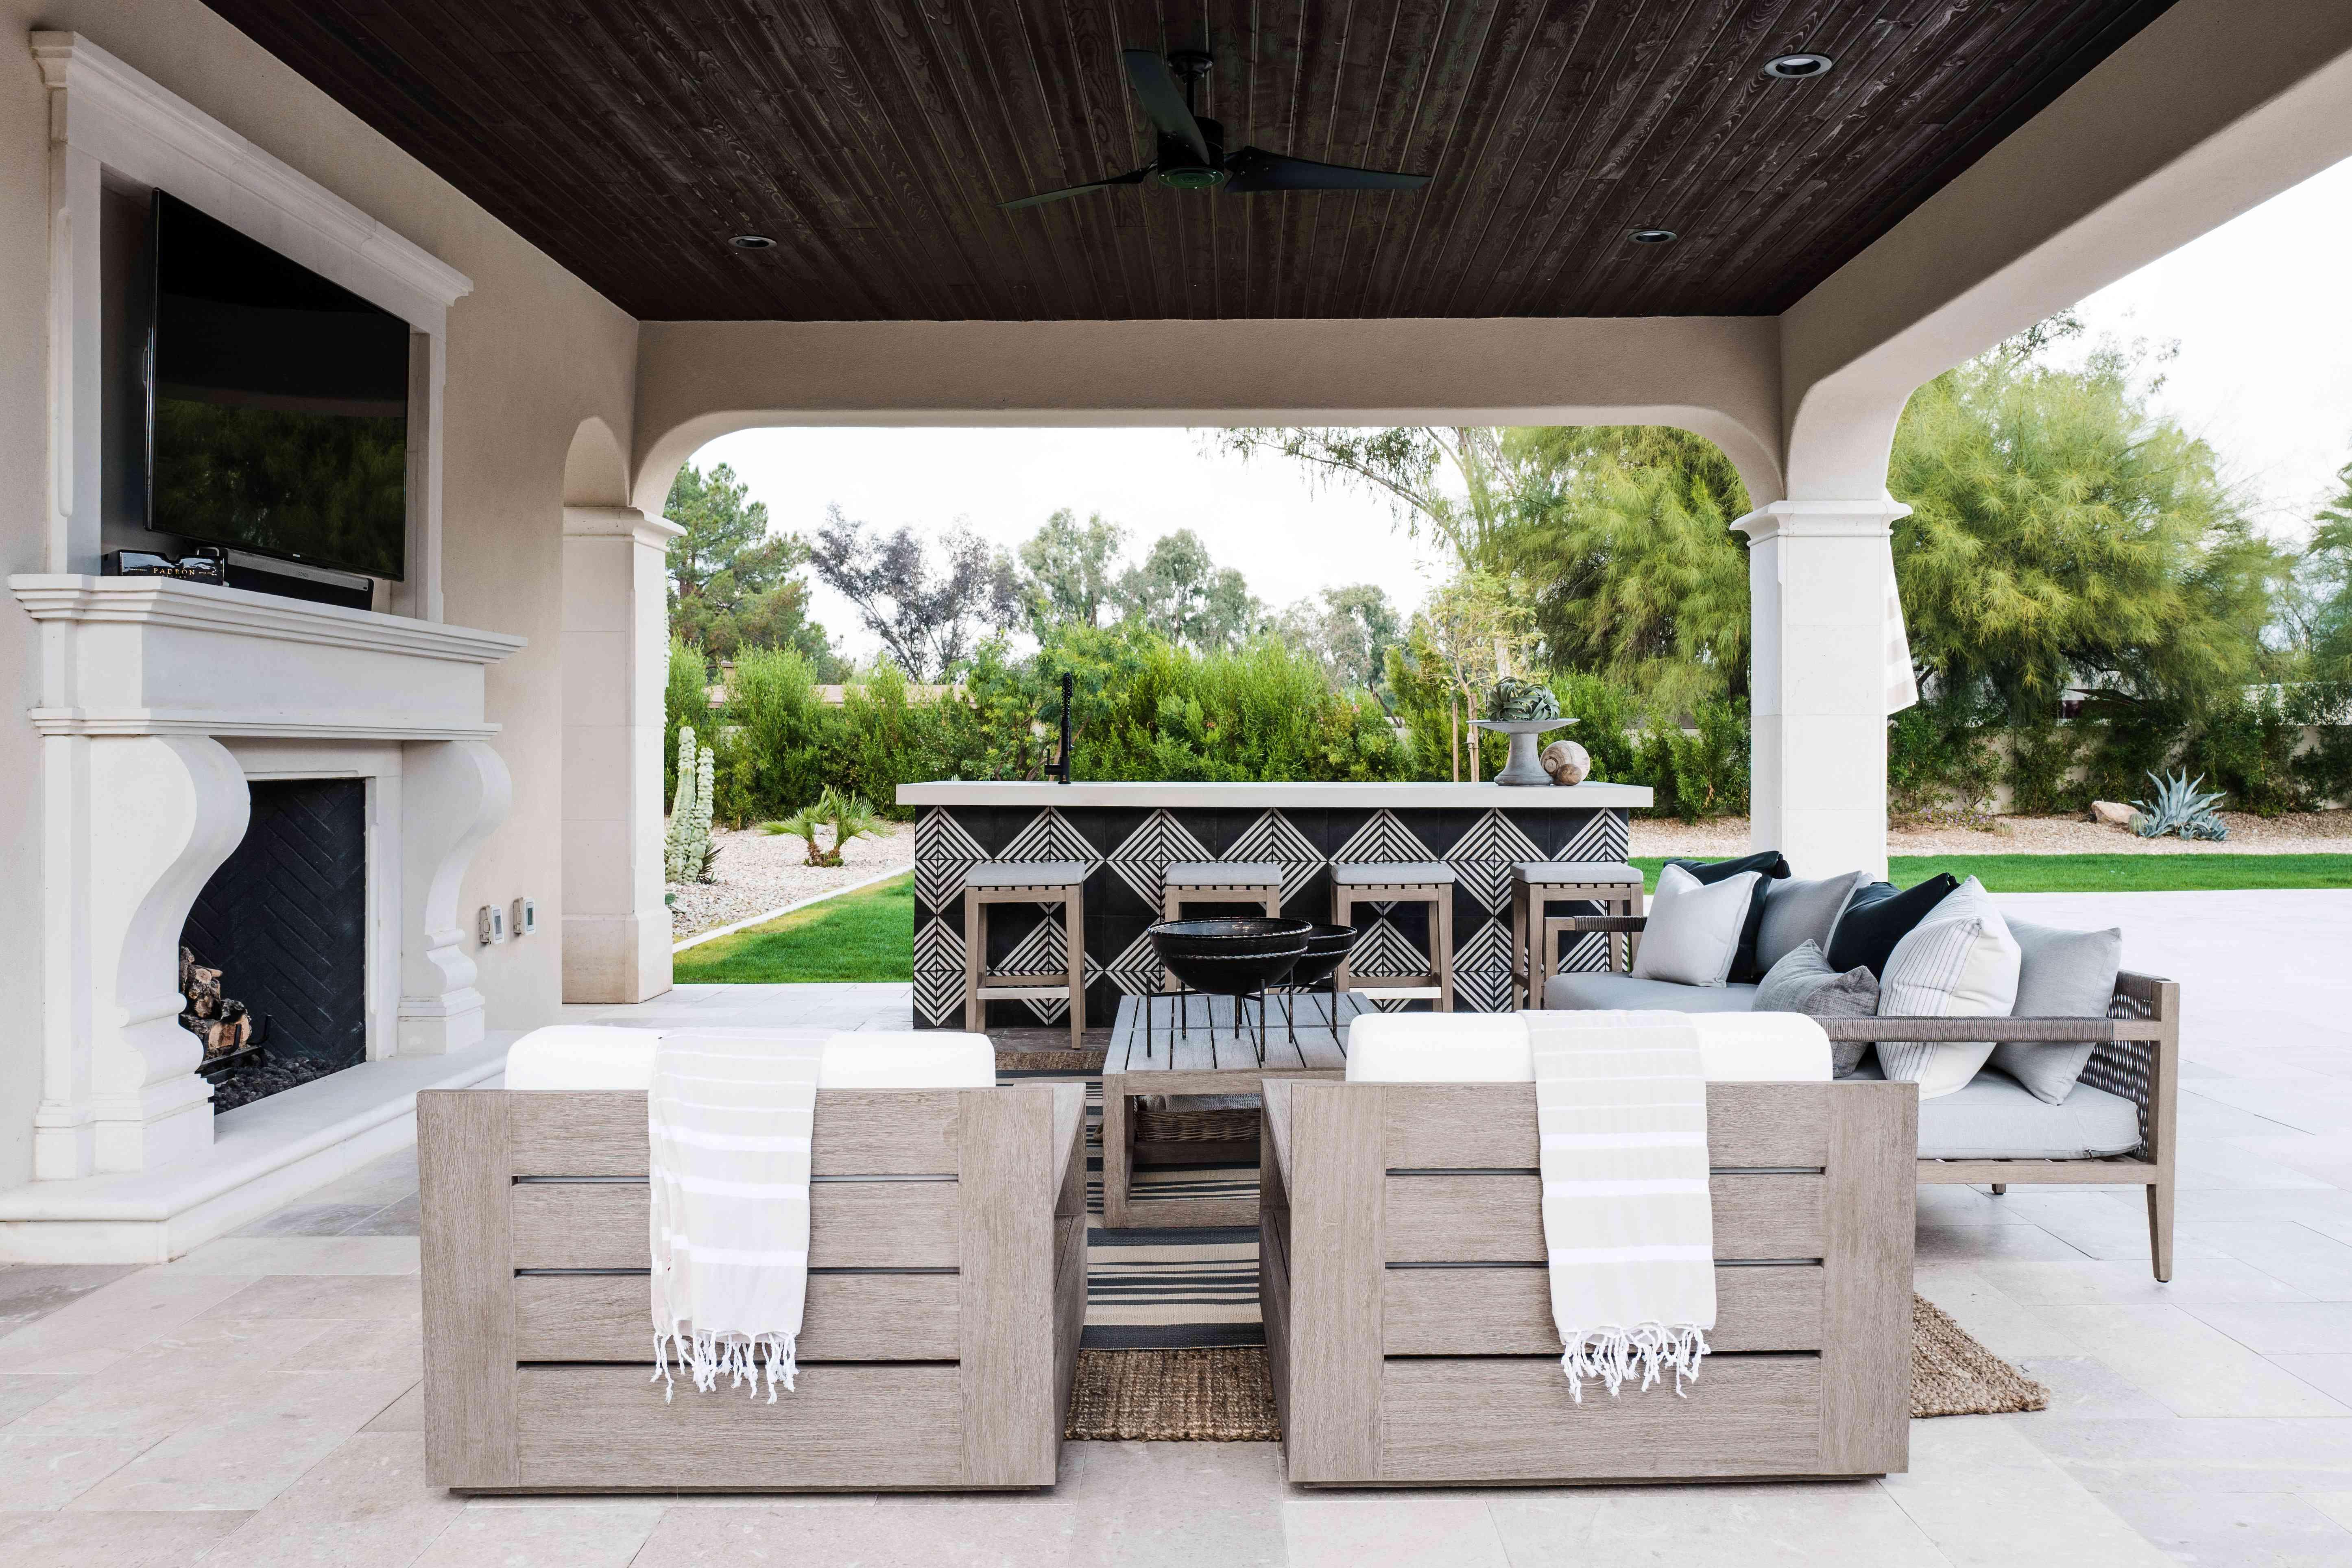 arizona home tour - outdoor space